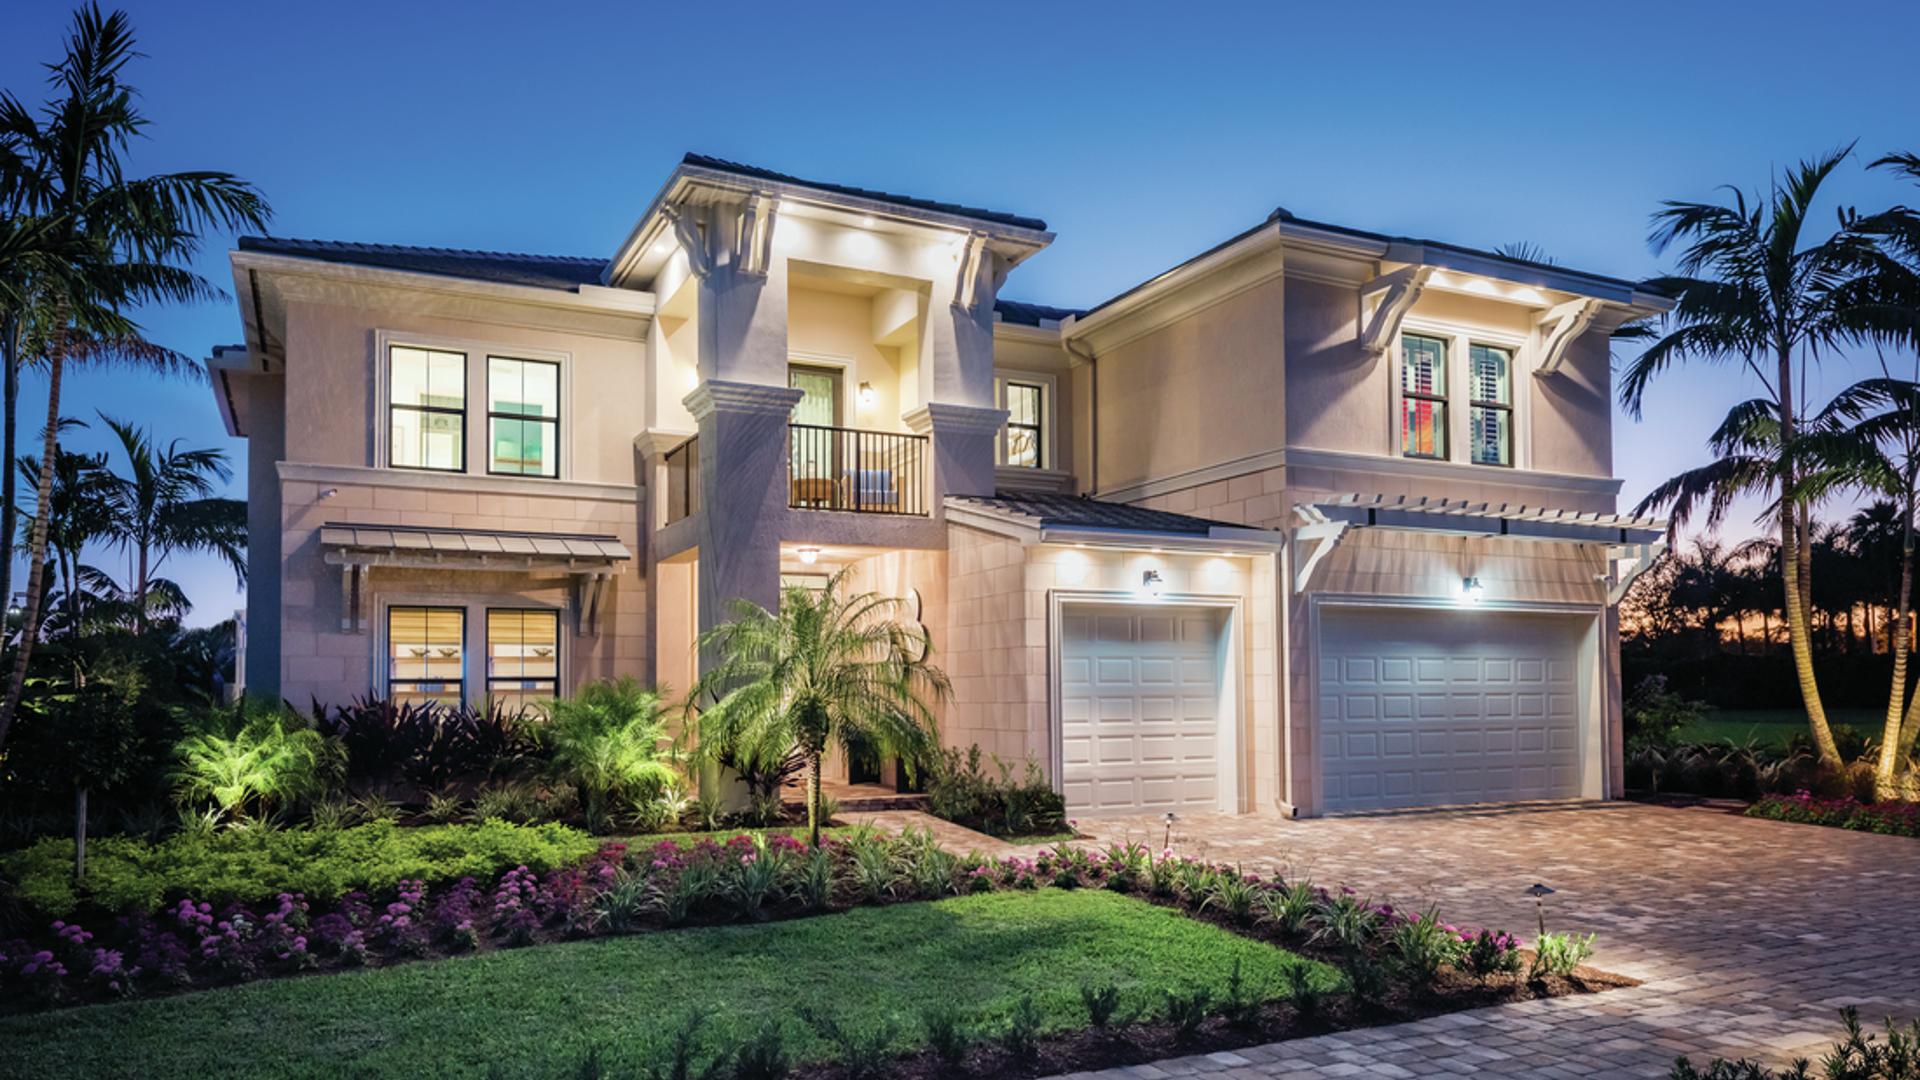 Callahan Boca Raton Model Home